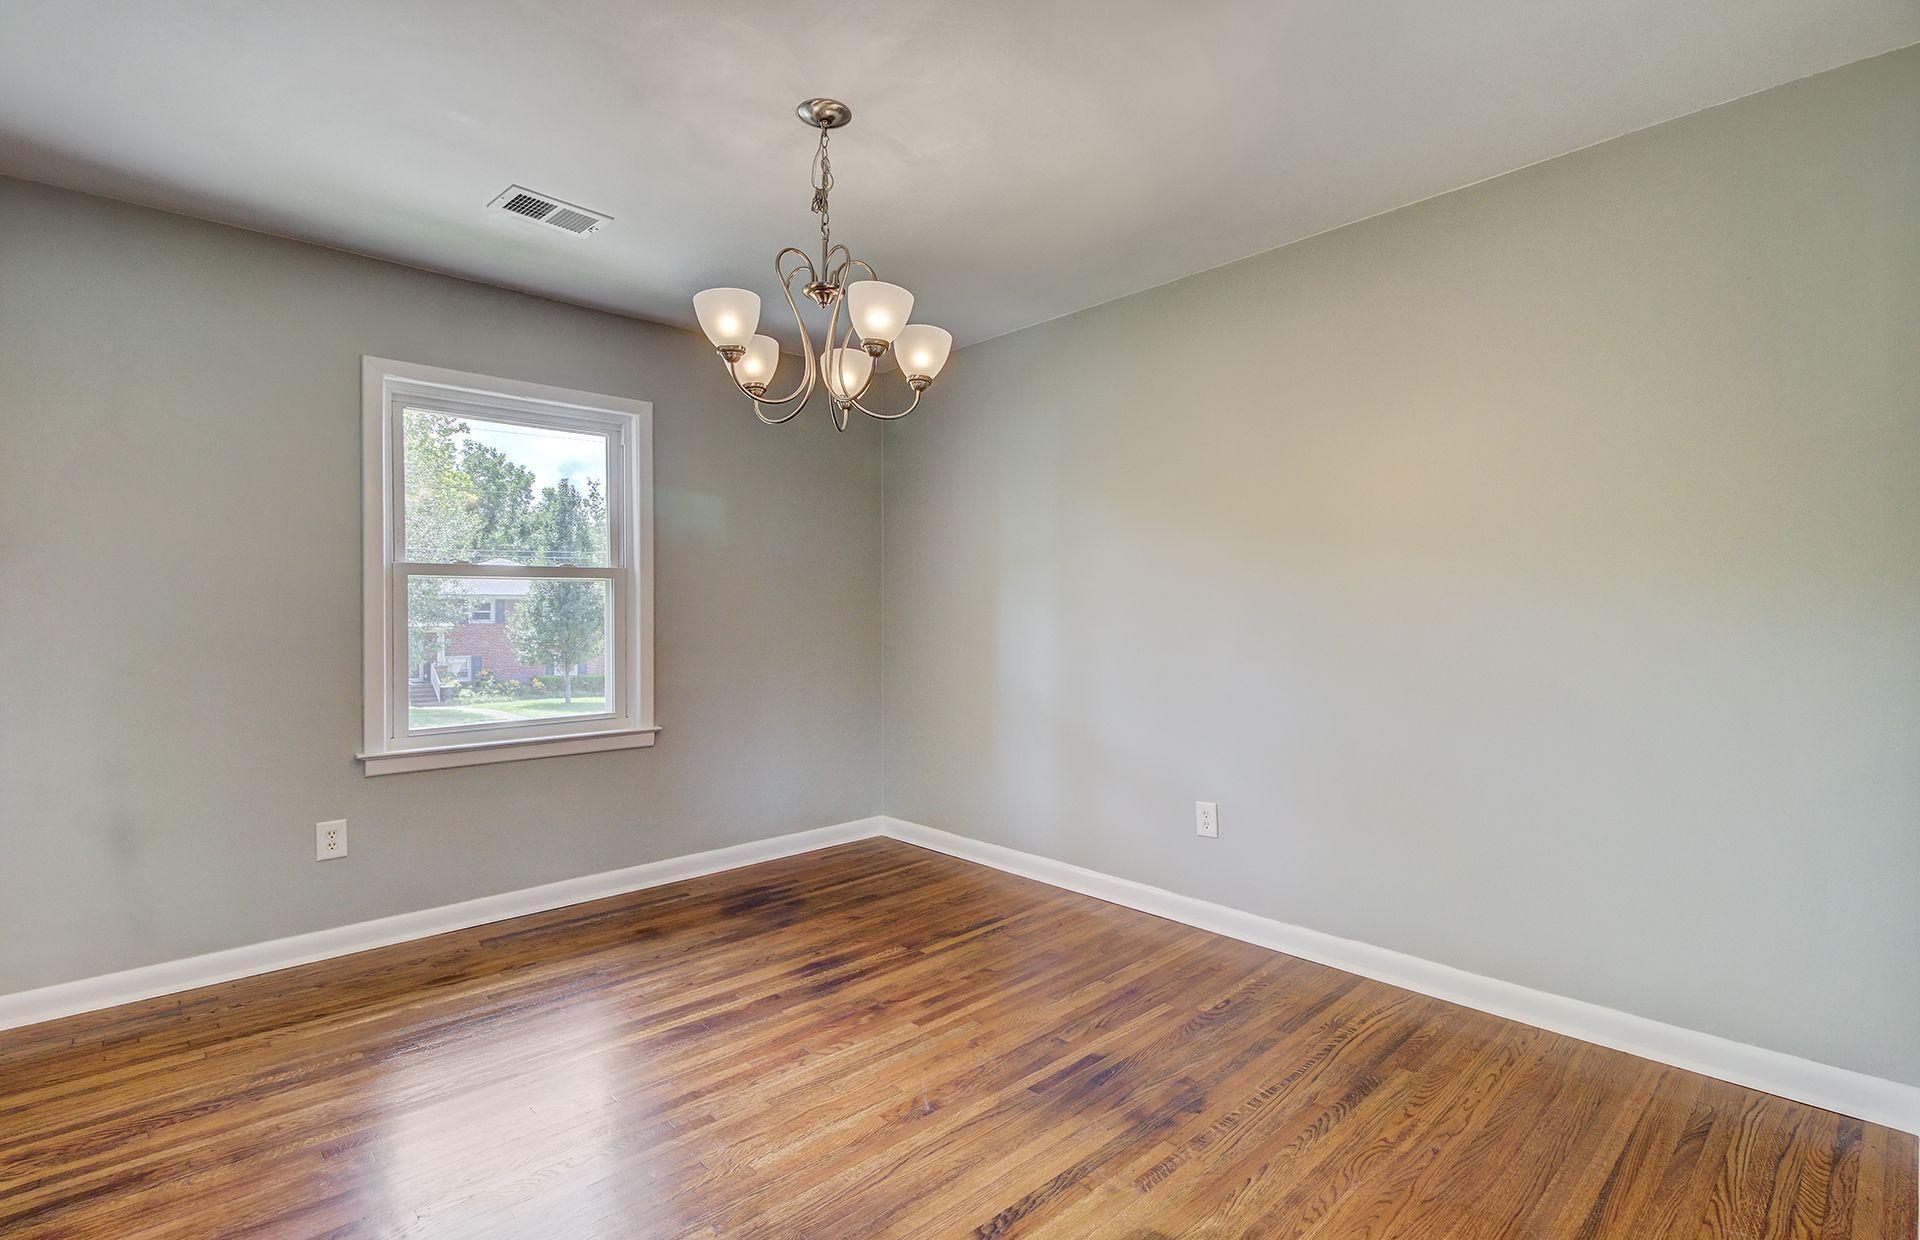 Belvedere Estates Homes For Sale - 6010 Ridgecrest, Hanahan, SC - 7